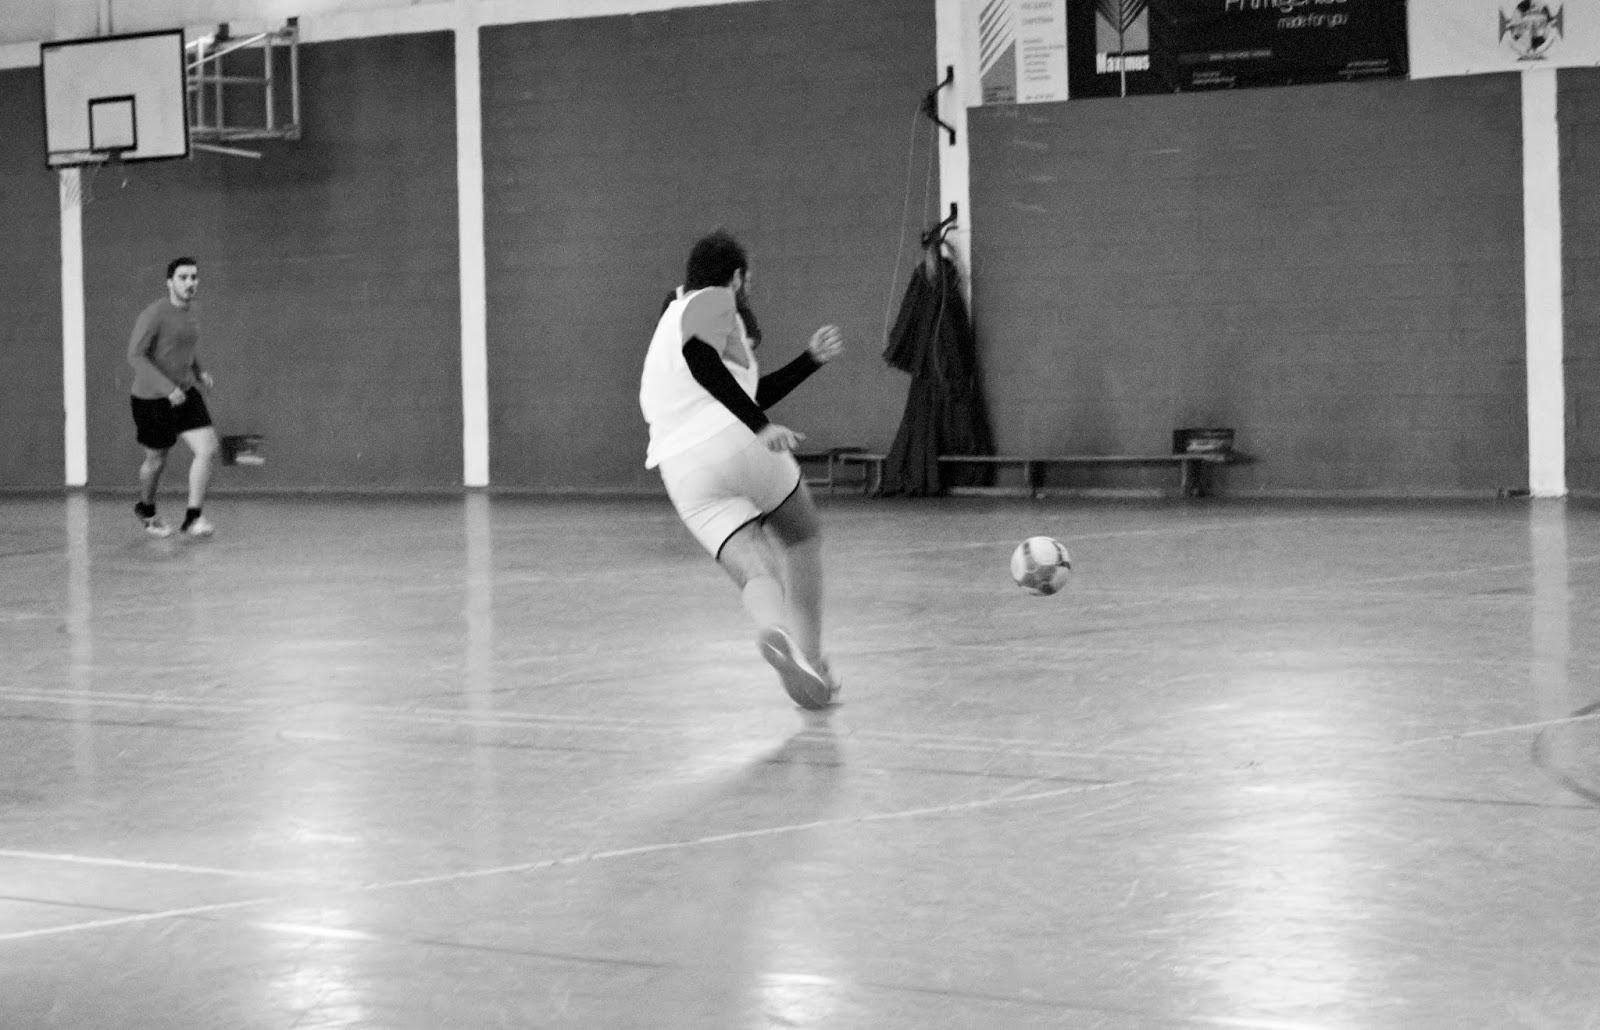 football-player-movement-6on6